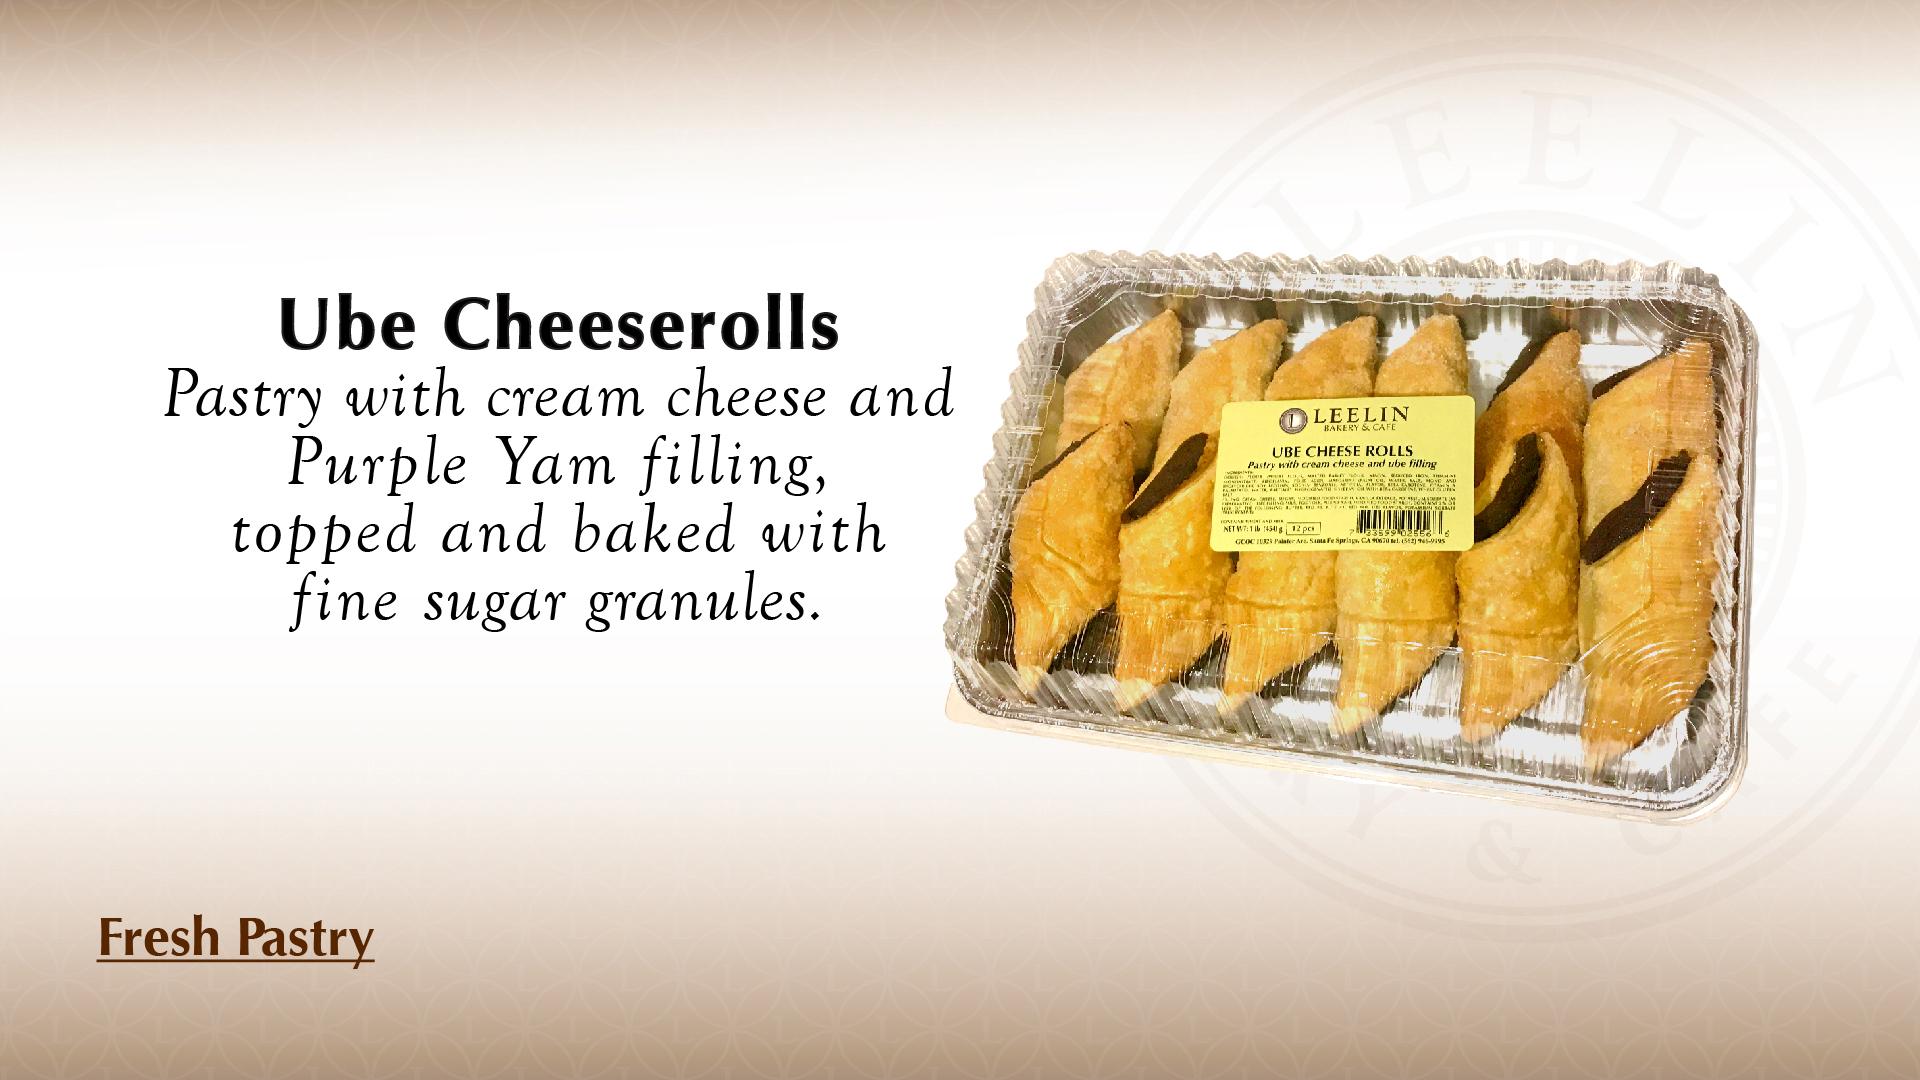 002 Ube Cheeserolls 1920x1080.jpg